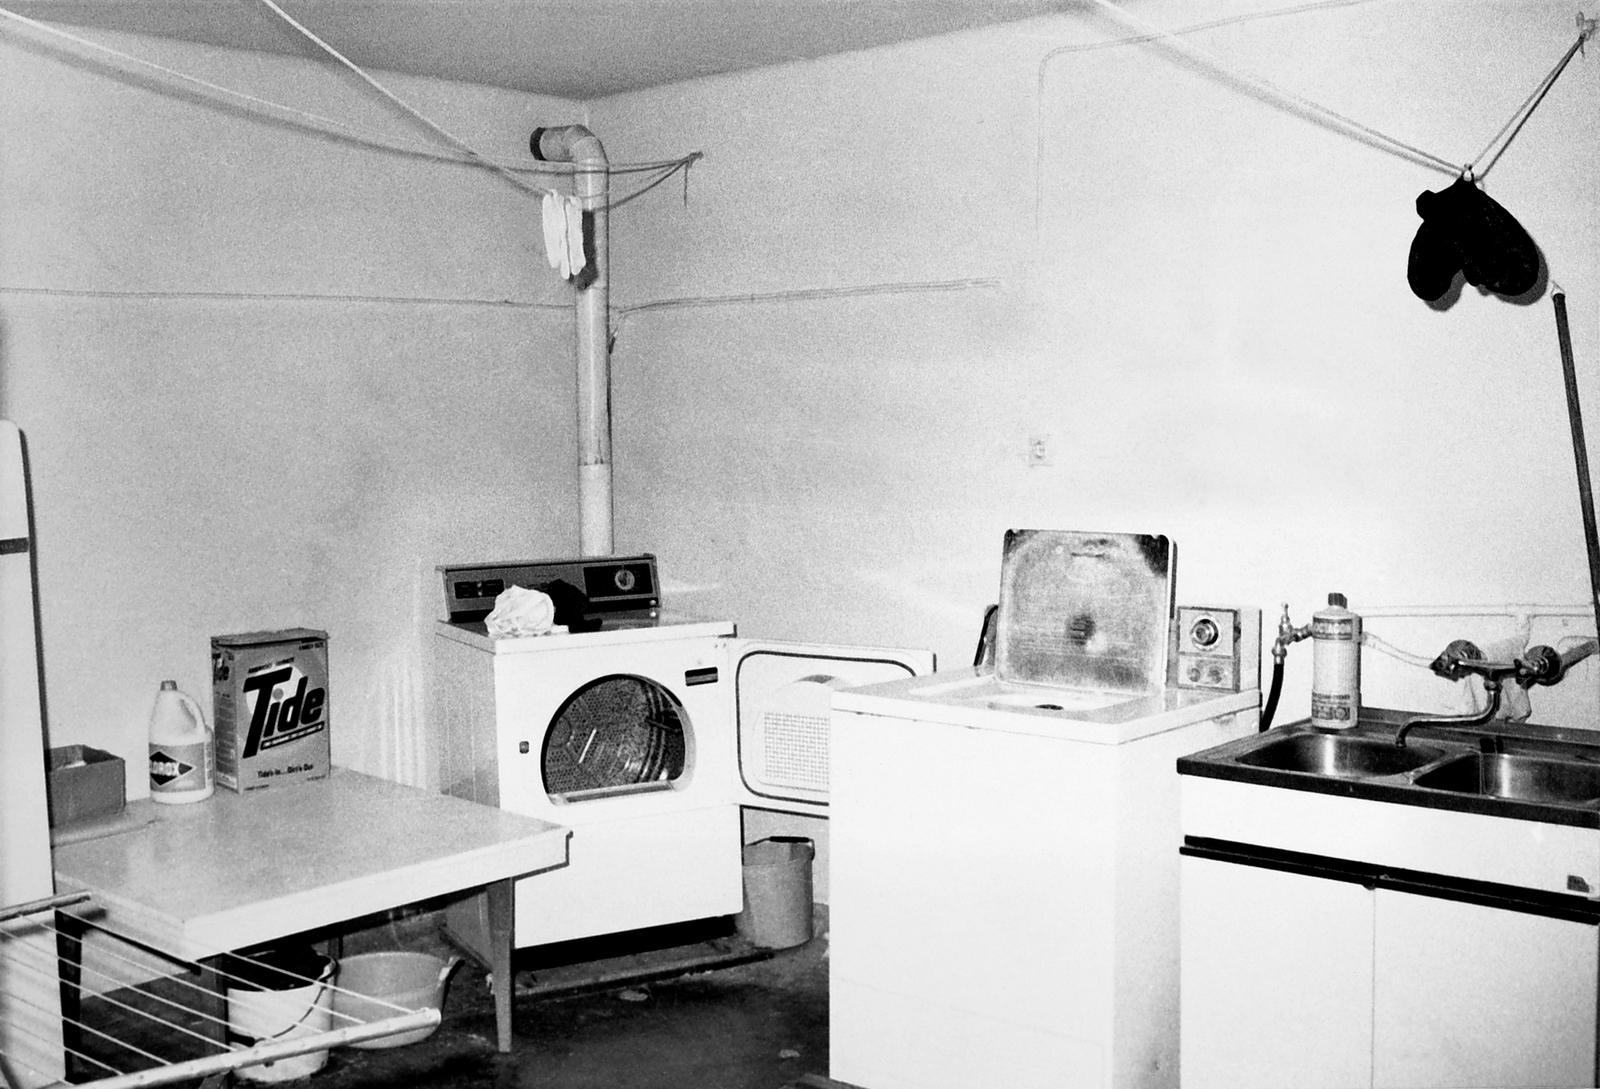 Belgrade - Department of Defense Agency Head Residence - 1965